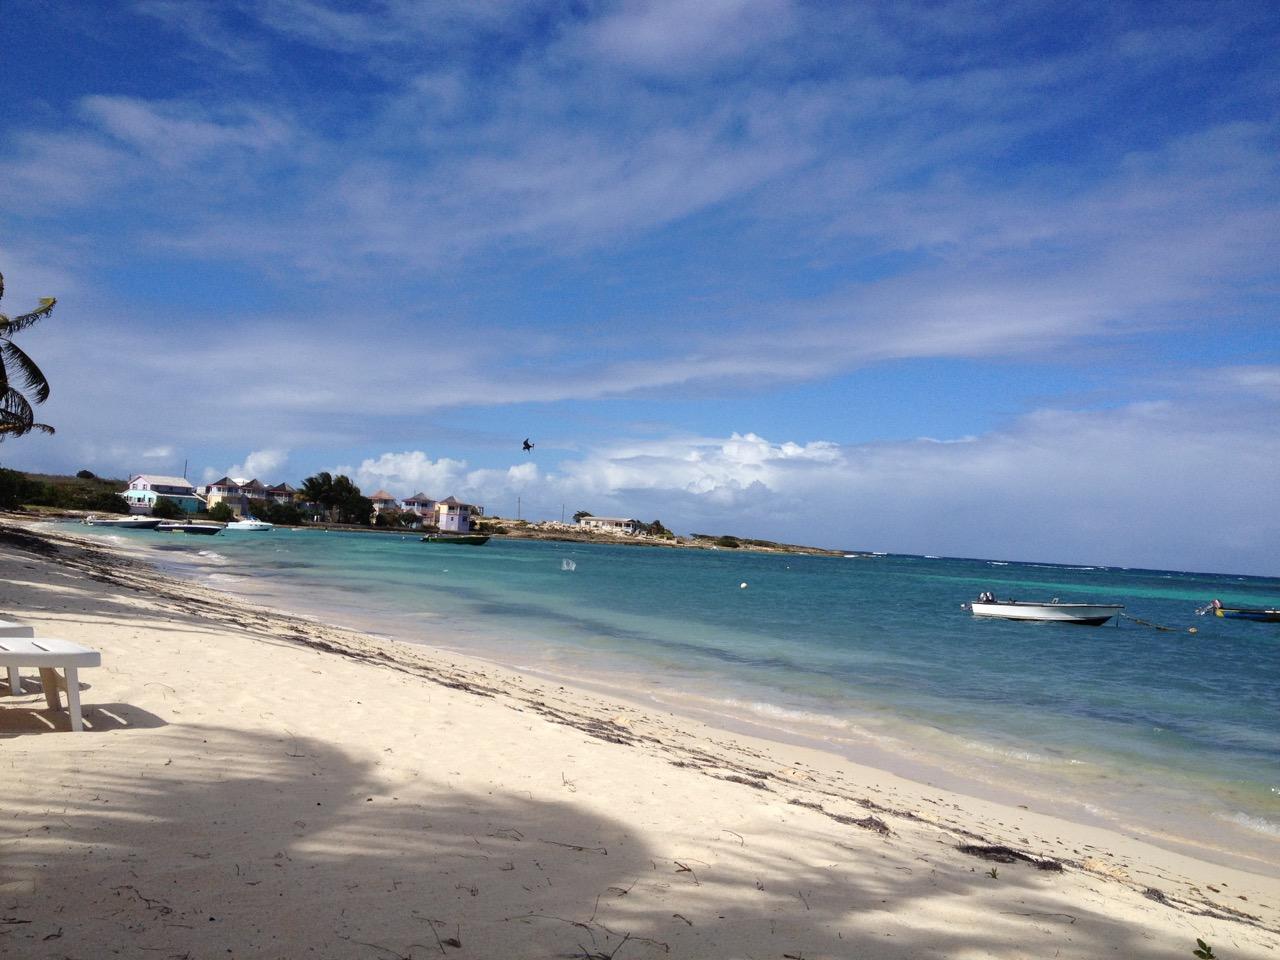 islandharbour